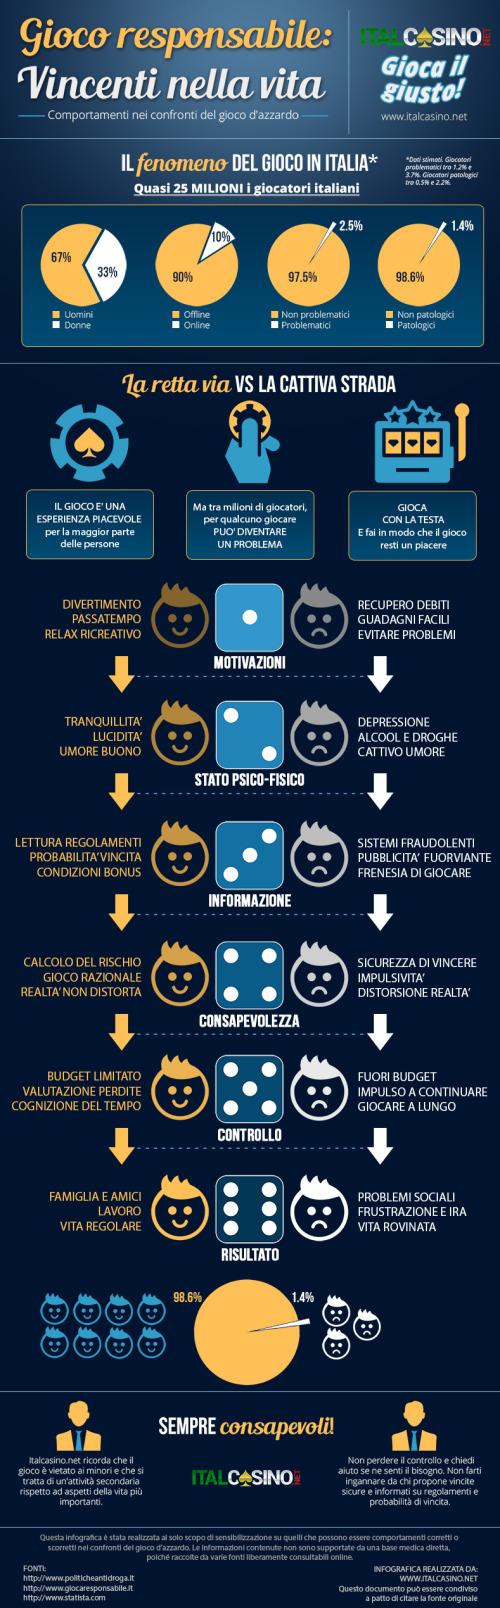 infografica sul gioco responsabile